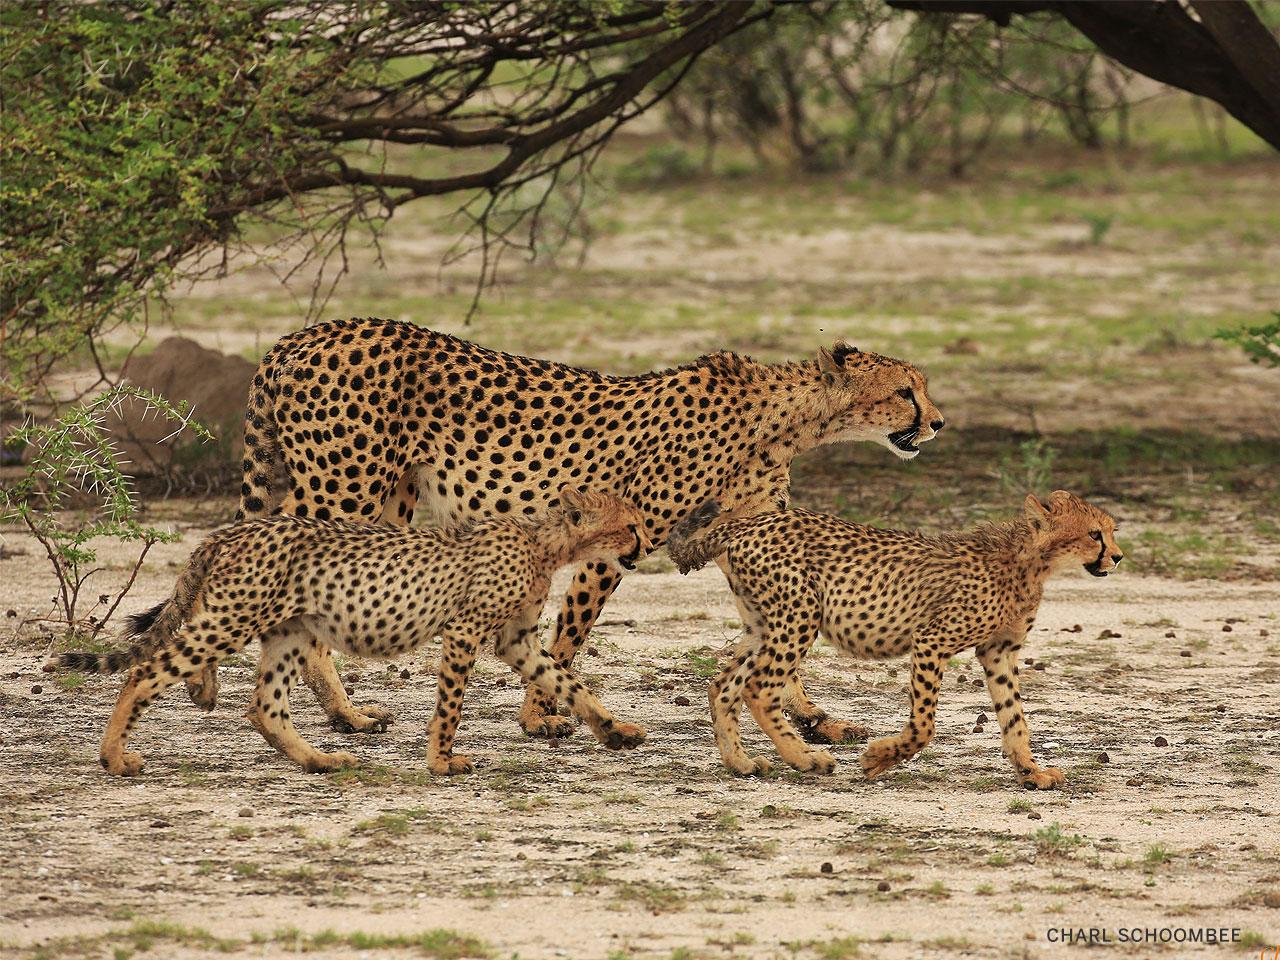 A female cheetah and two cubs walking beneath an acacia tree.